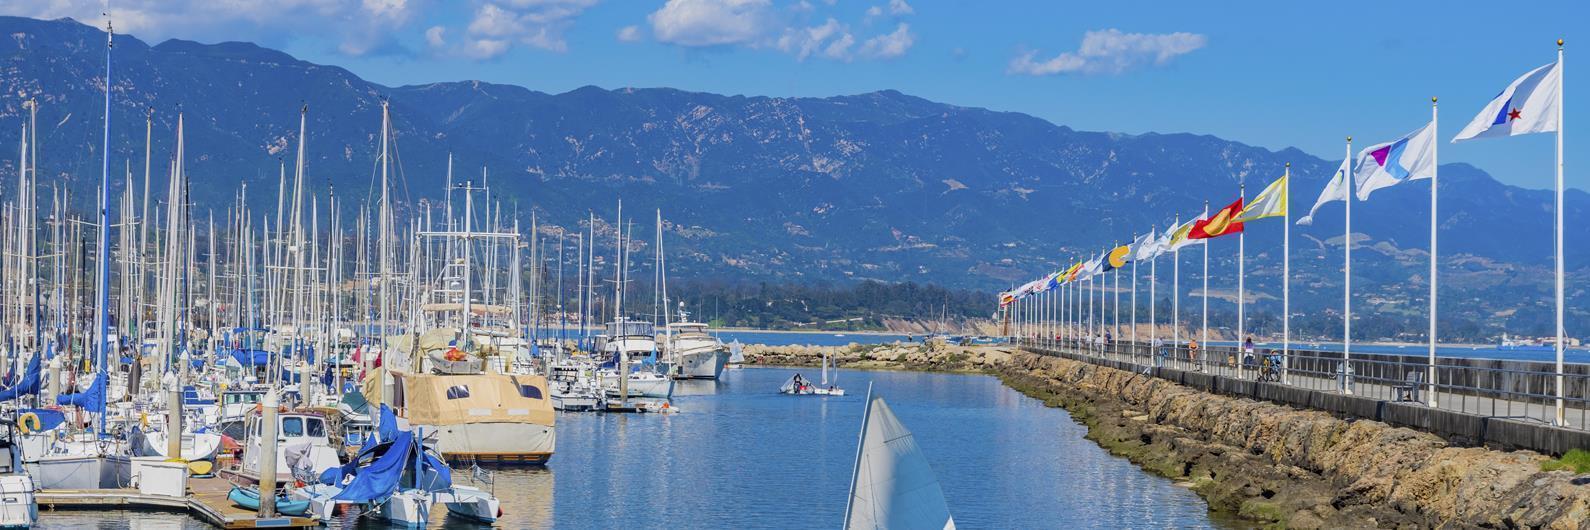 Cheap Flights From Missoula To Santa Barbara Frontier